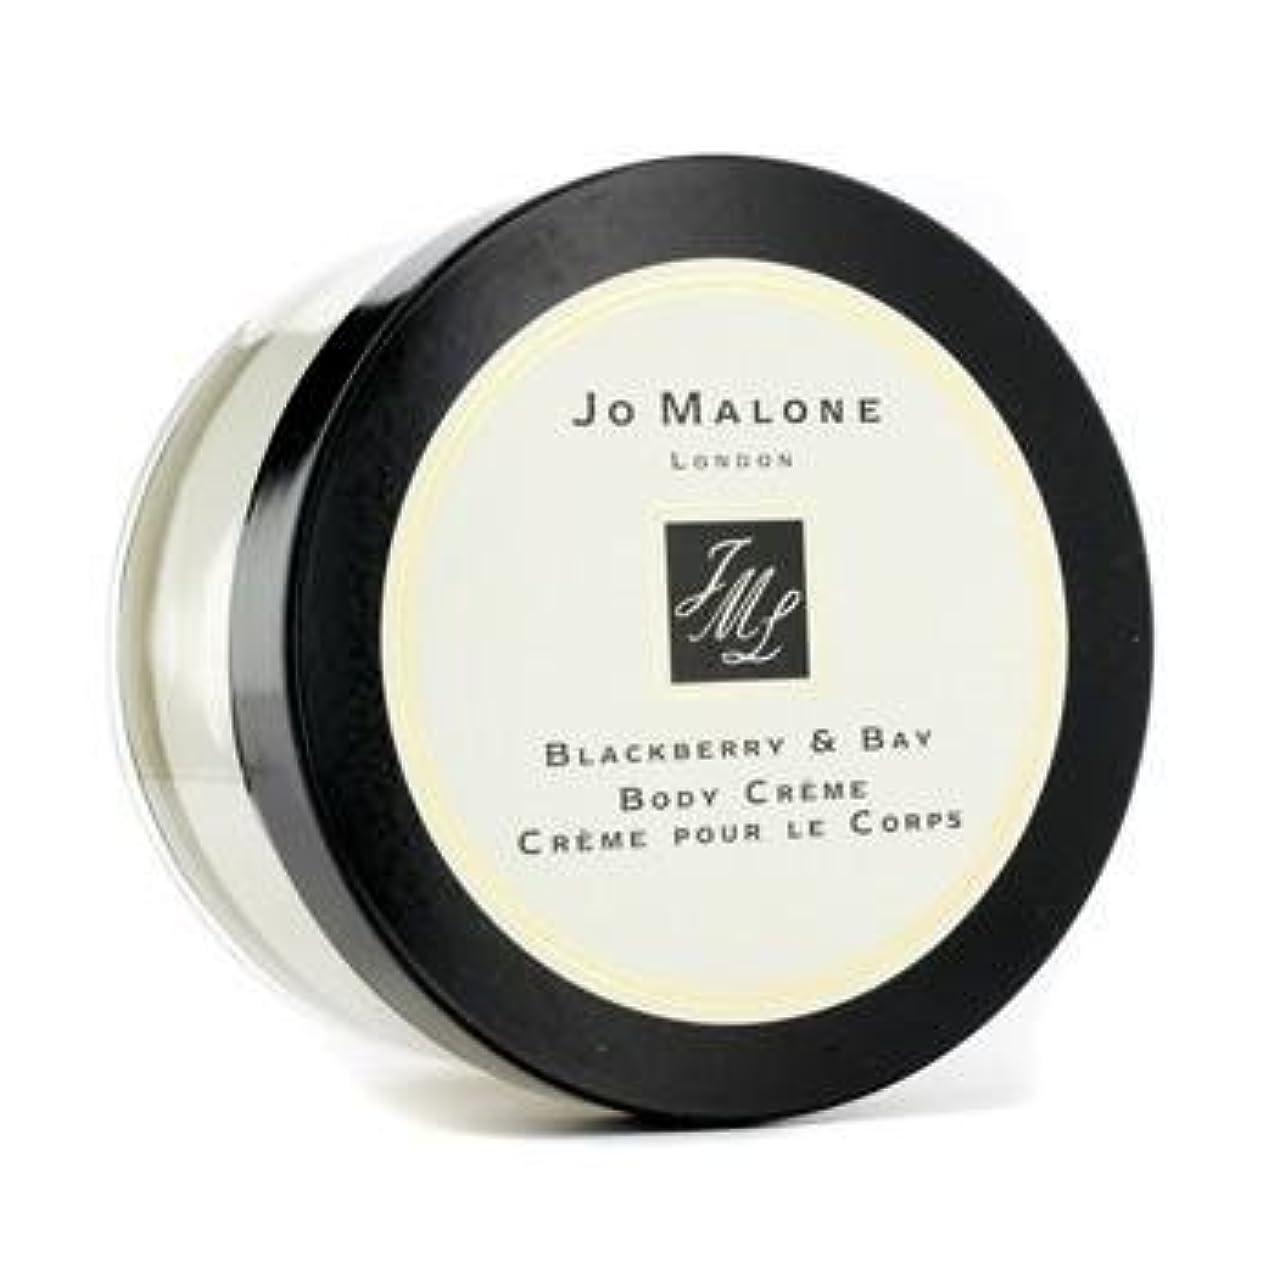 JO MALONE ジョー マローン ブラックベリー & ベイ ボディクリーム 175ml [並行輸入品]